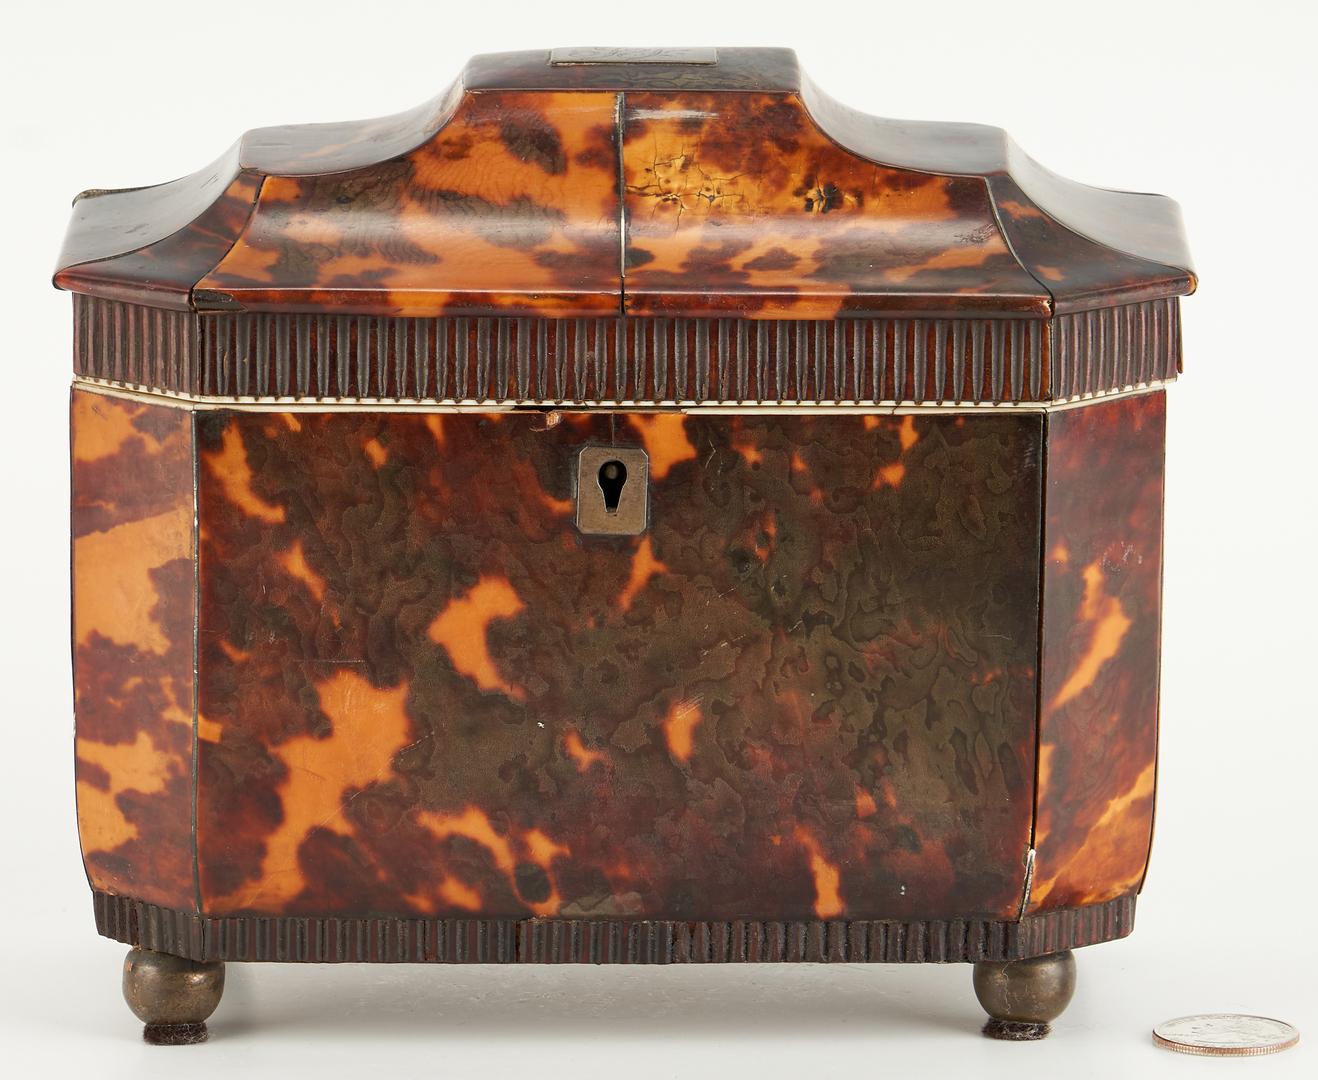 Lot 76: English Regency Double Compartment Tortoiseshell Tea Caddy